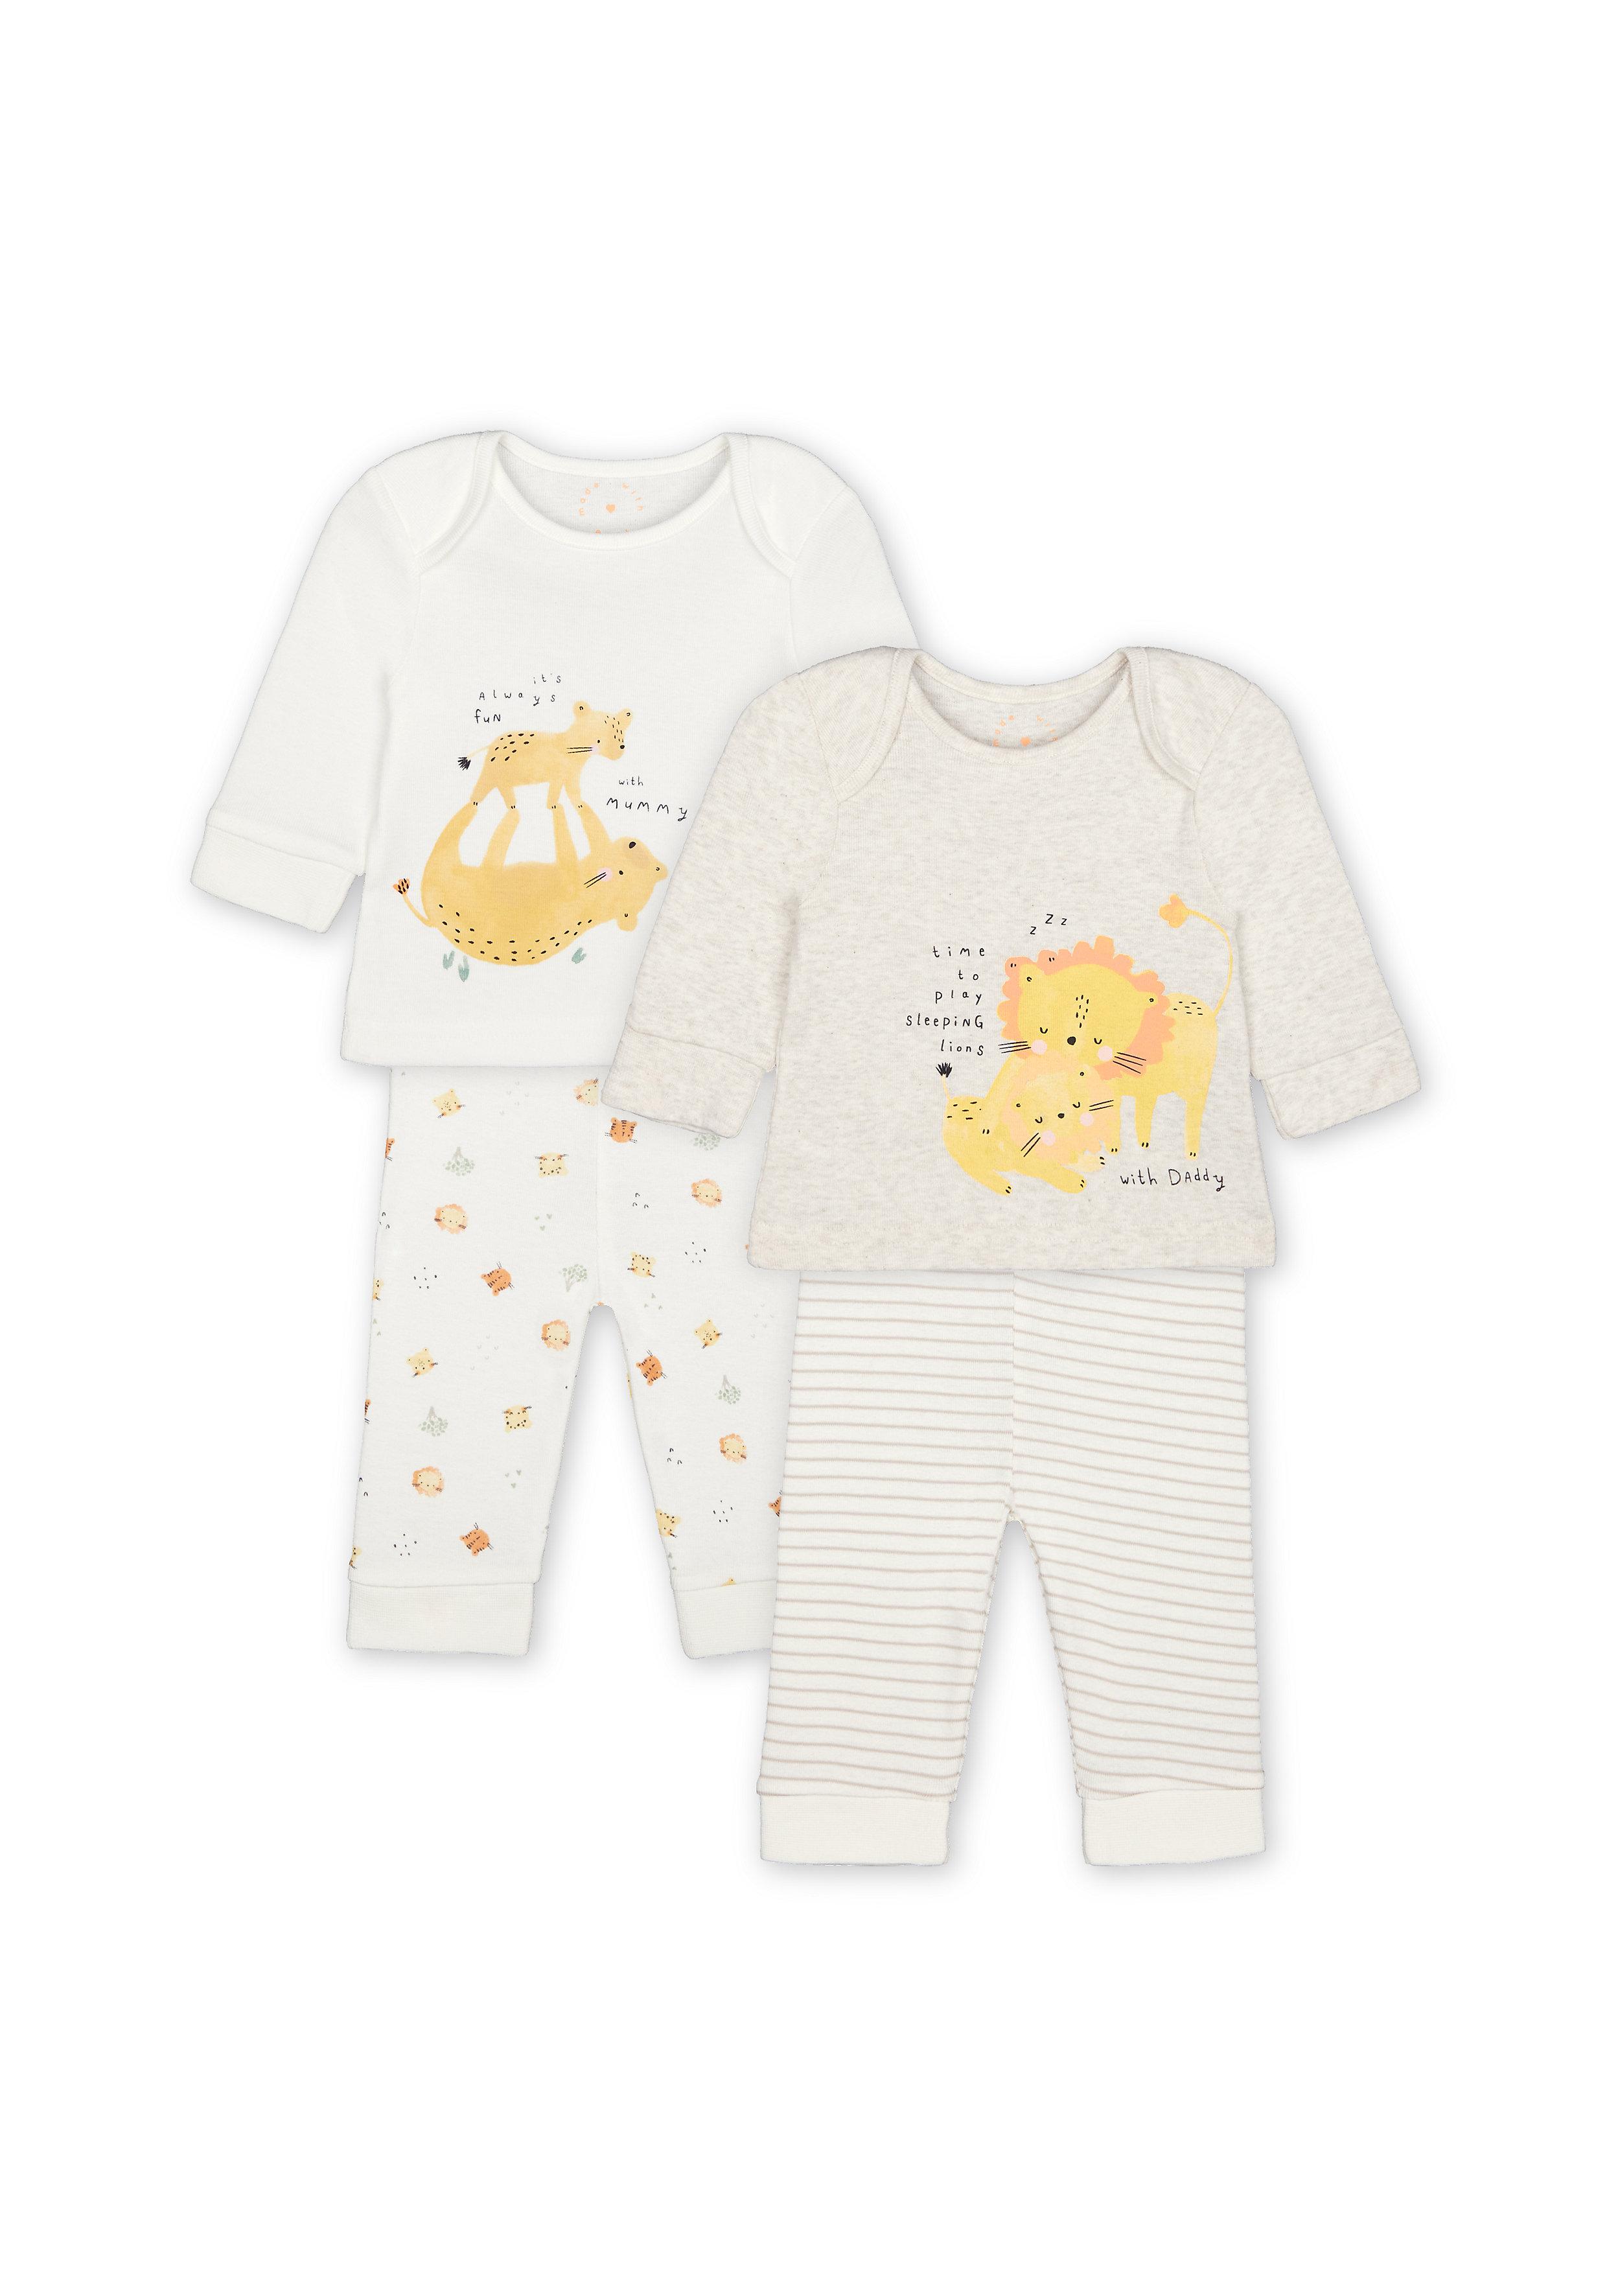 Mothercare | Unisex Full Sleeves Lion Print Pyjamas - Pack Of 2 - White Grey